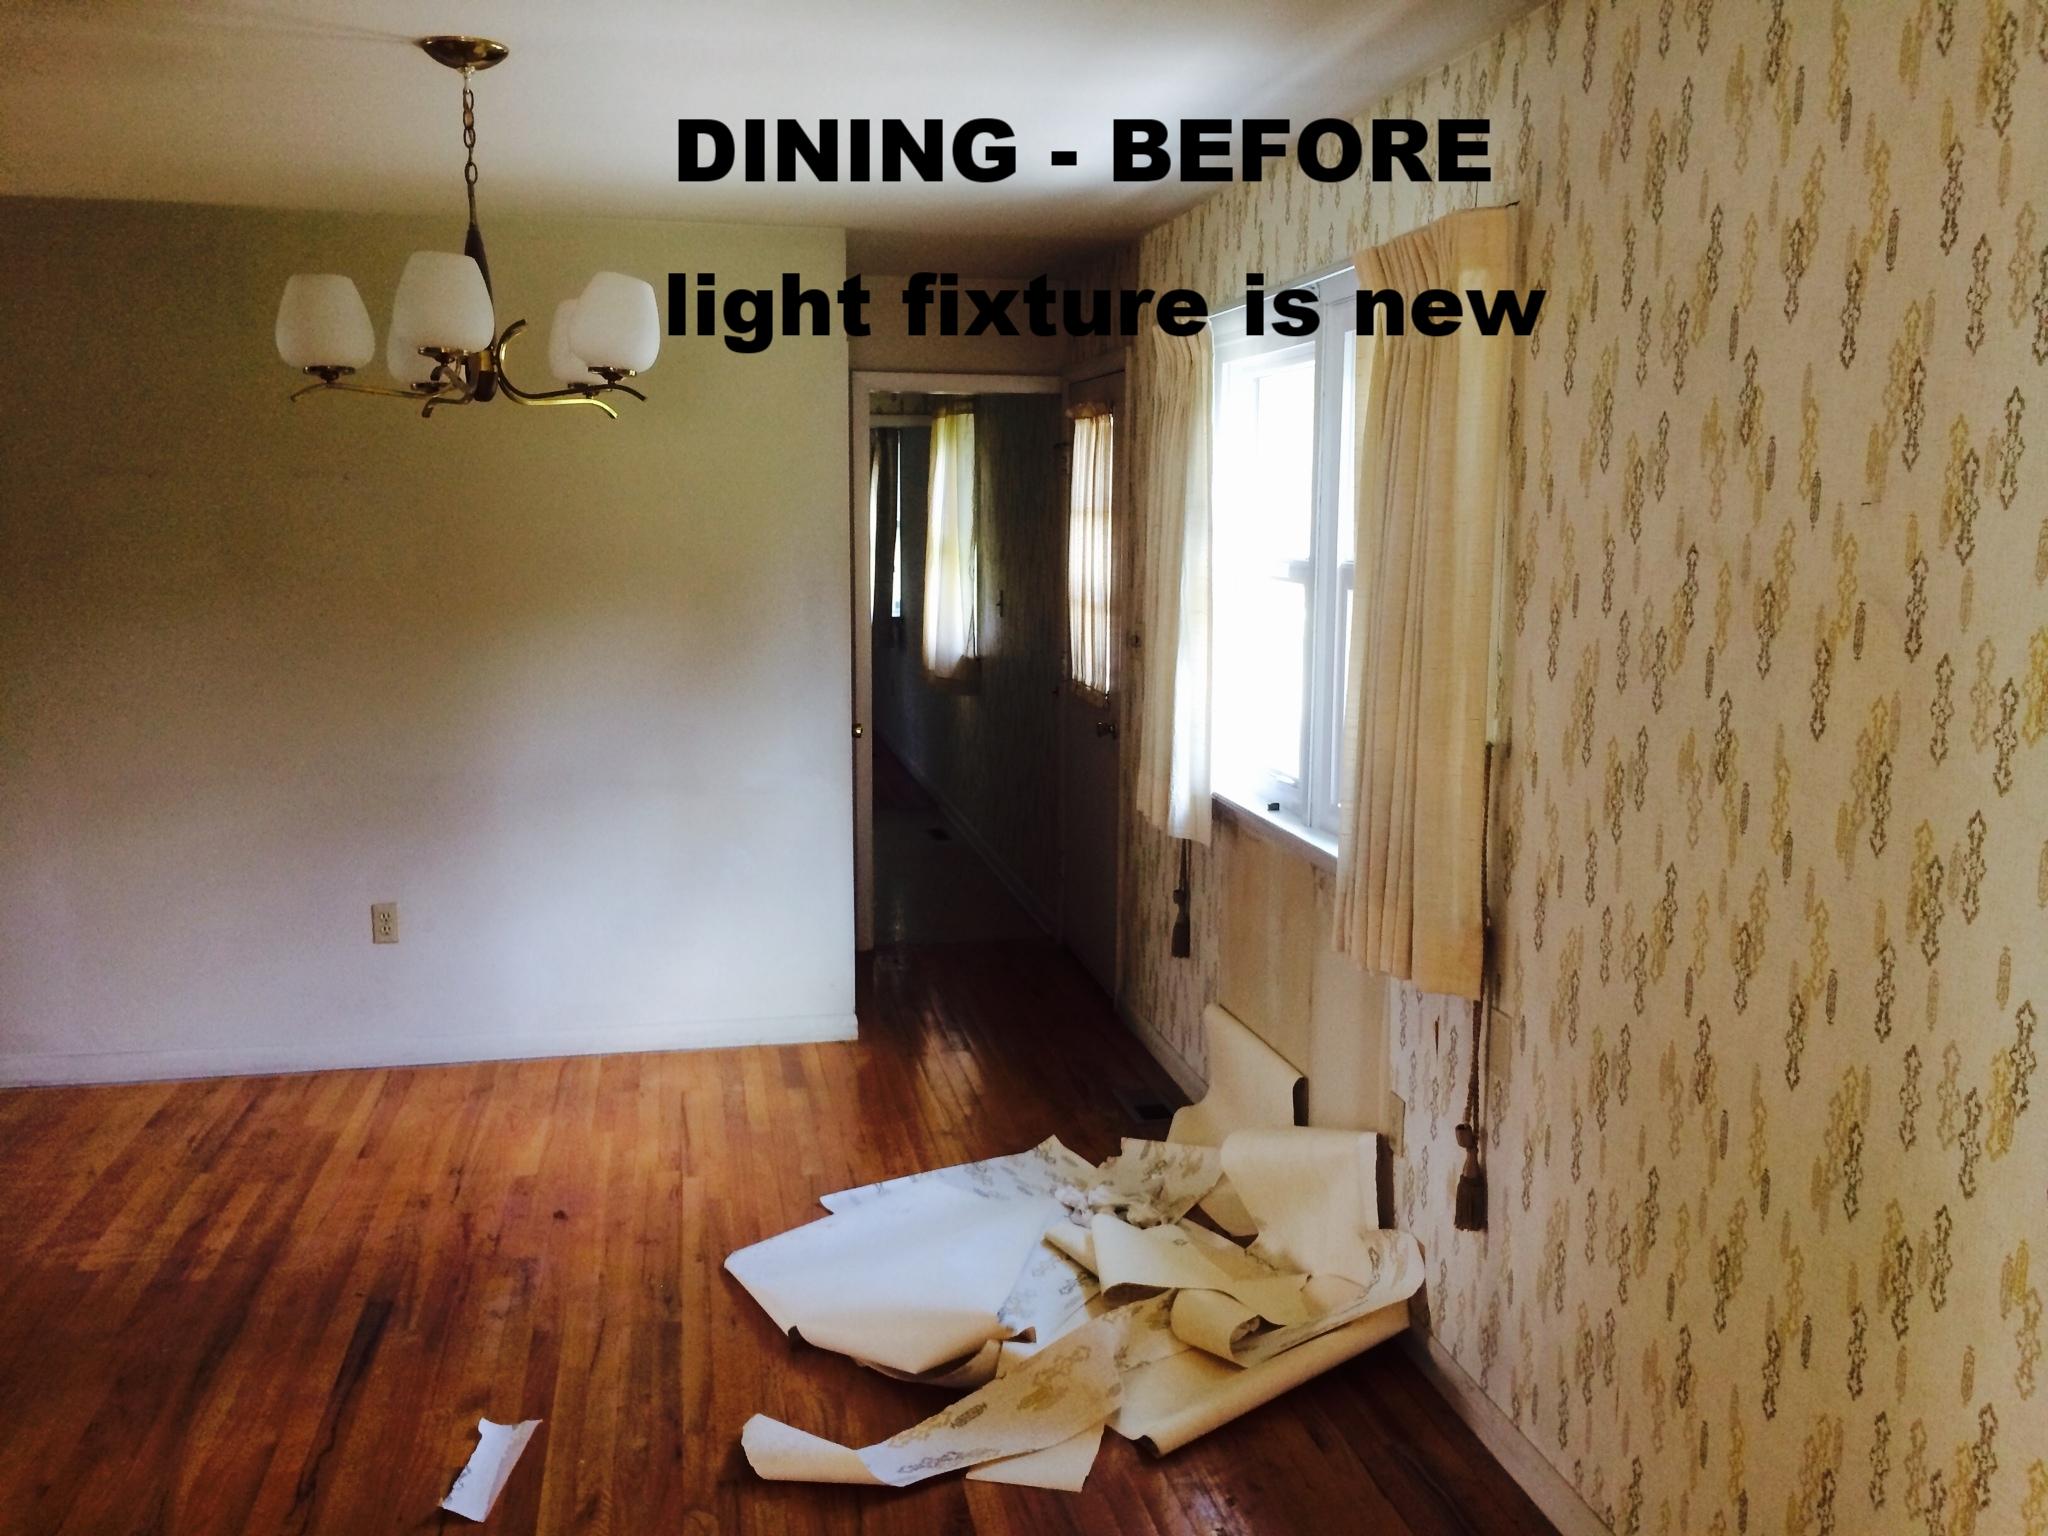 10.9.17_dining before.JPG